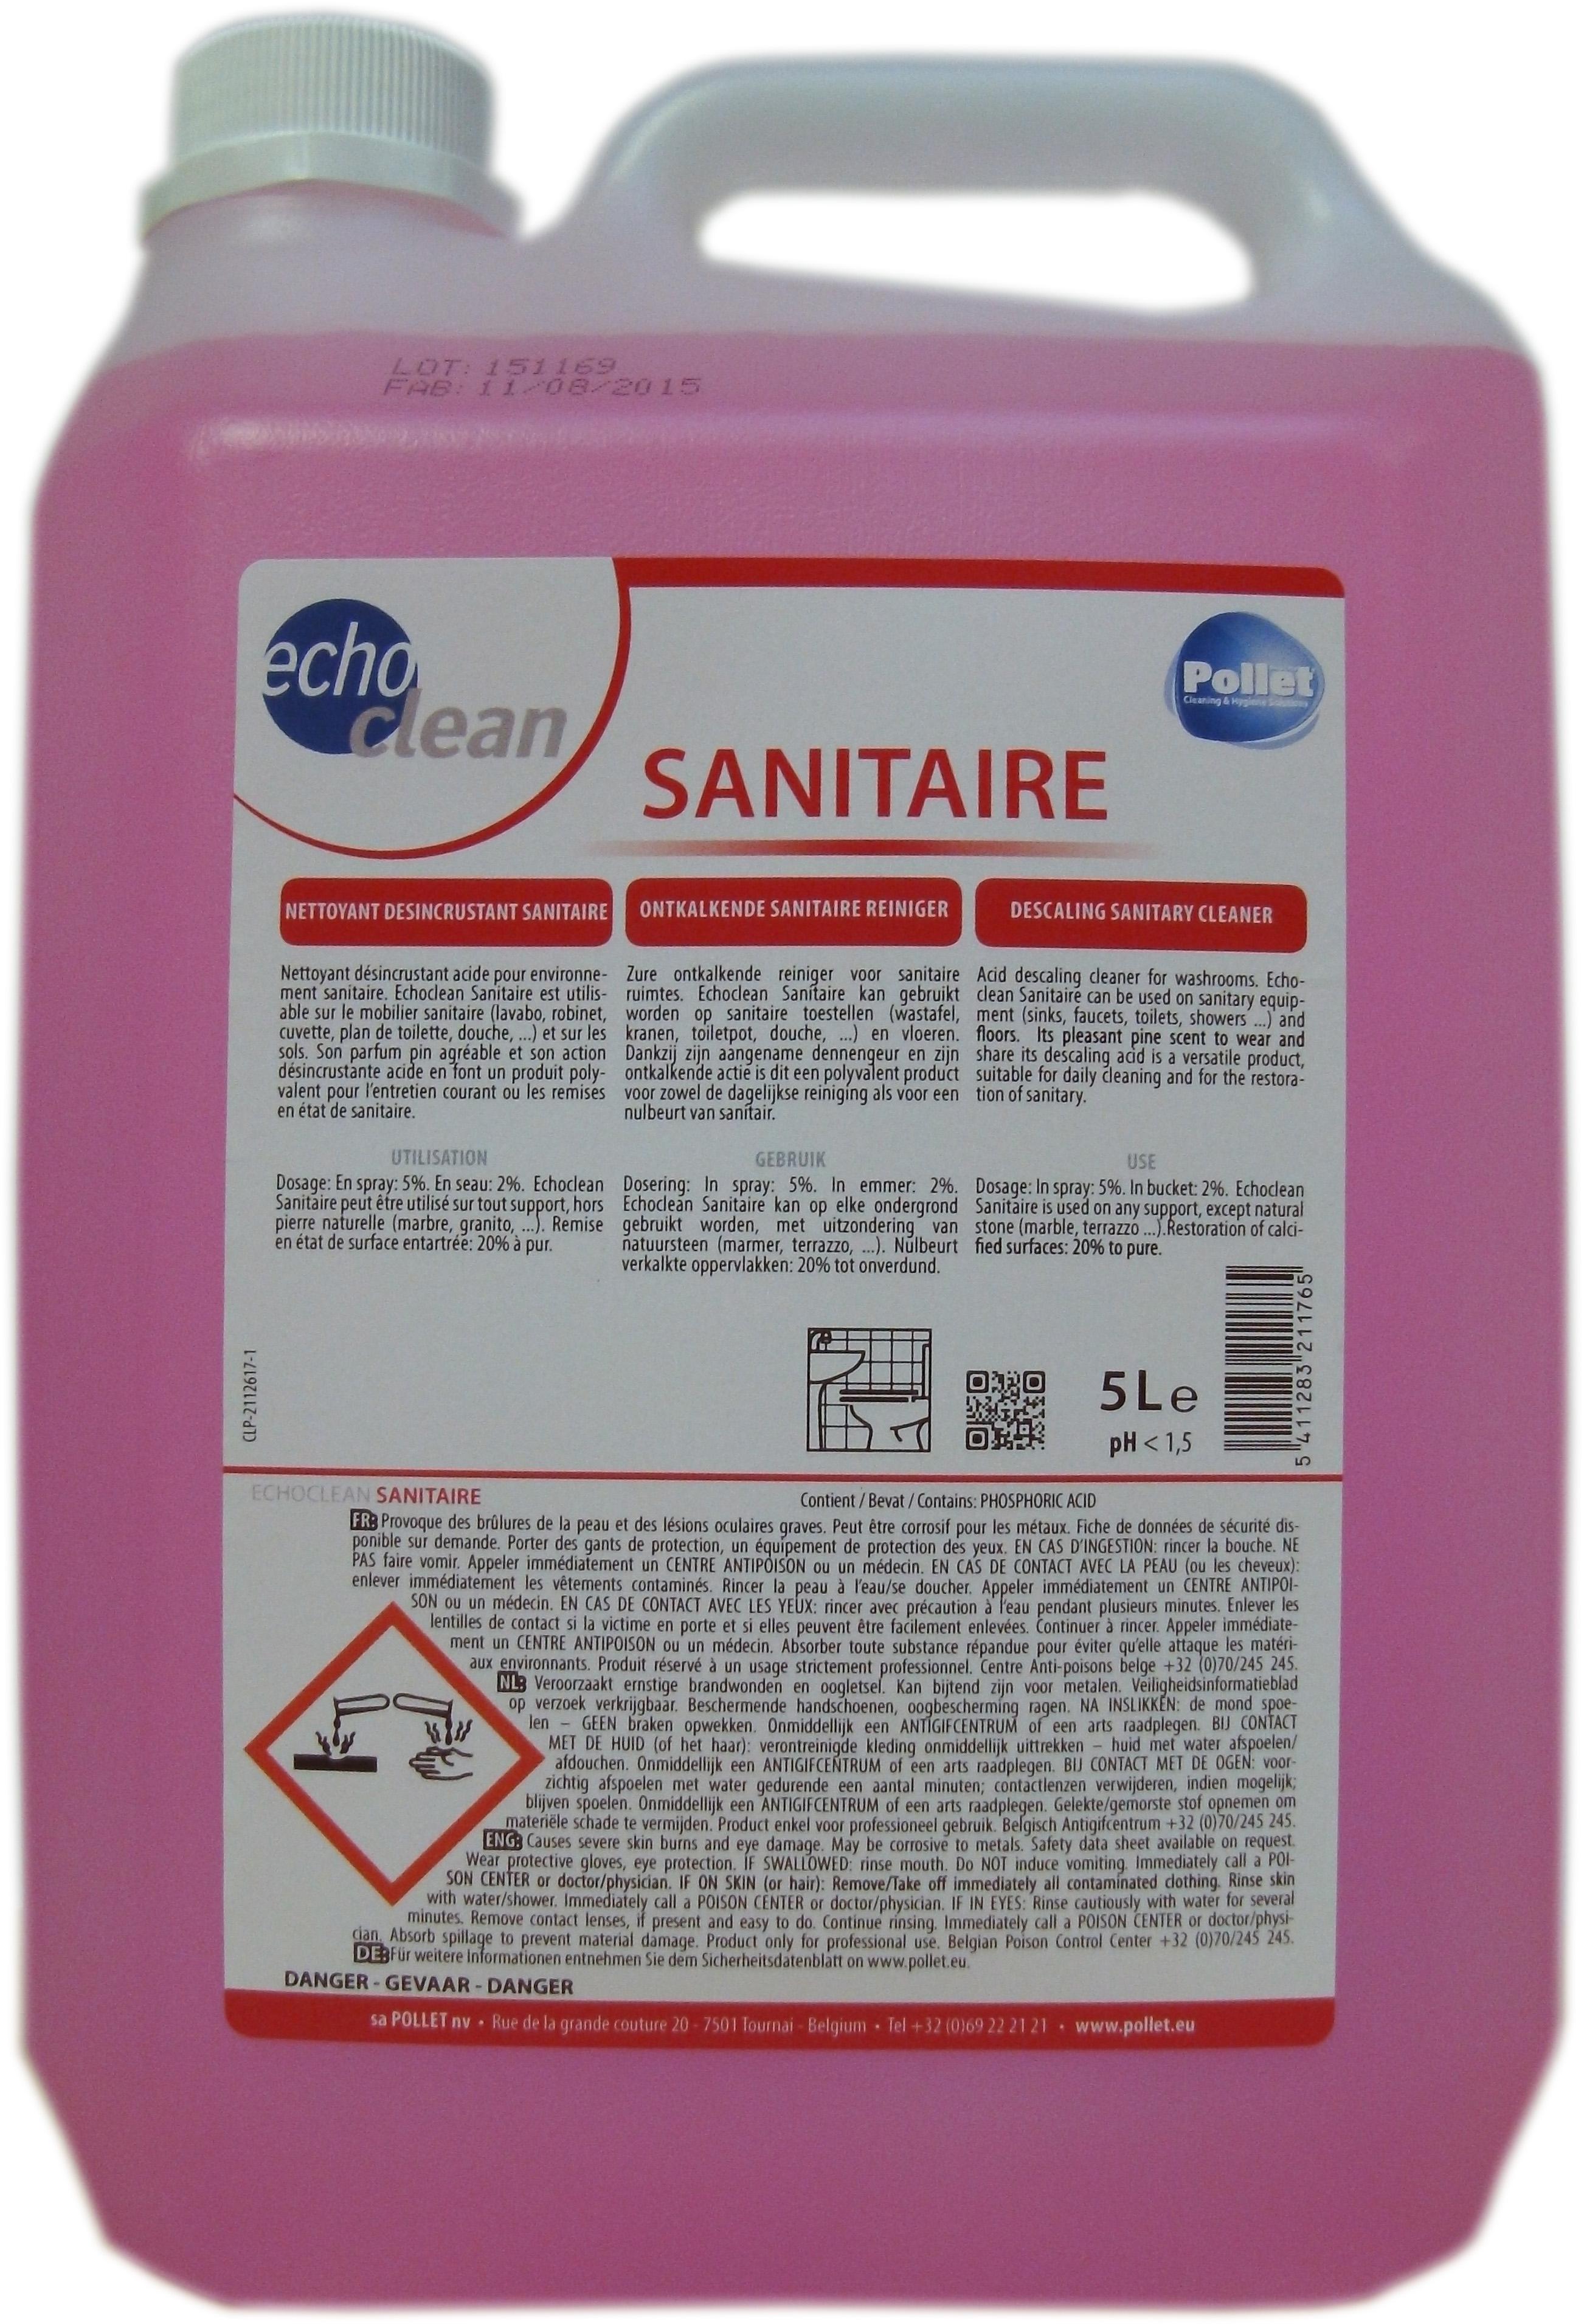 ECHOCLEAN sanitaire